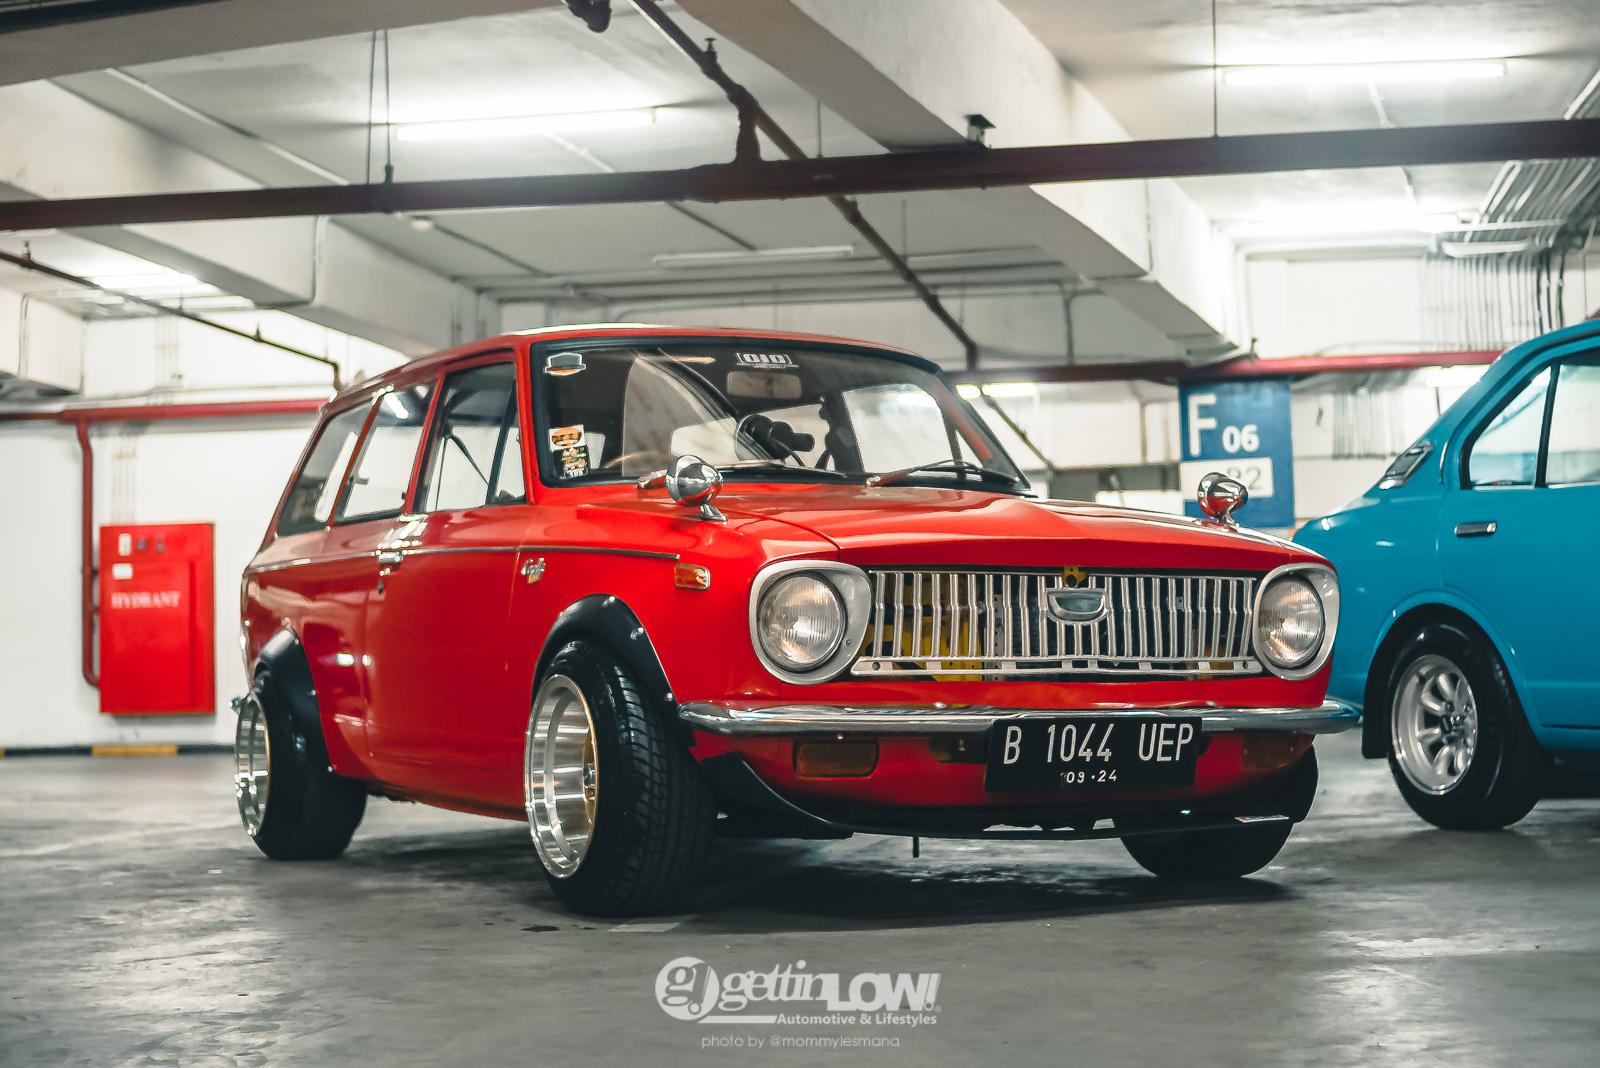 1968 Toyota Corolla KE16